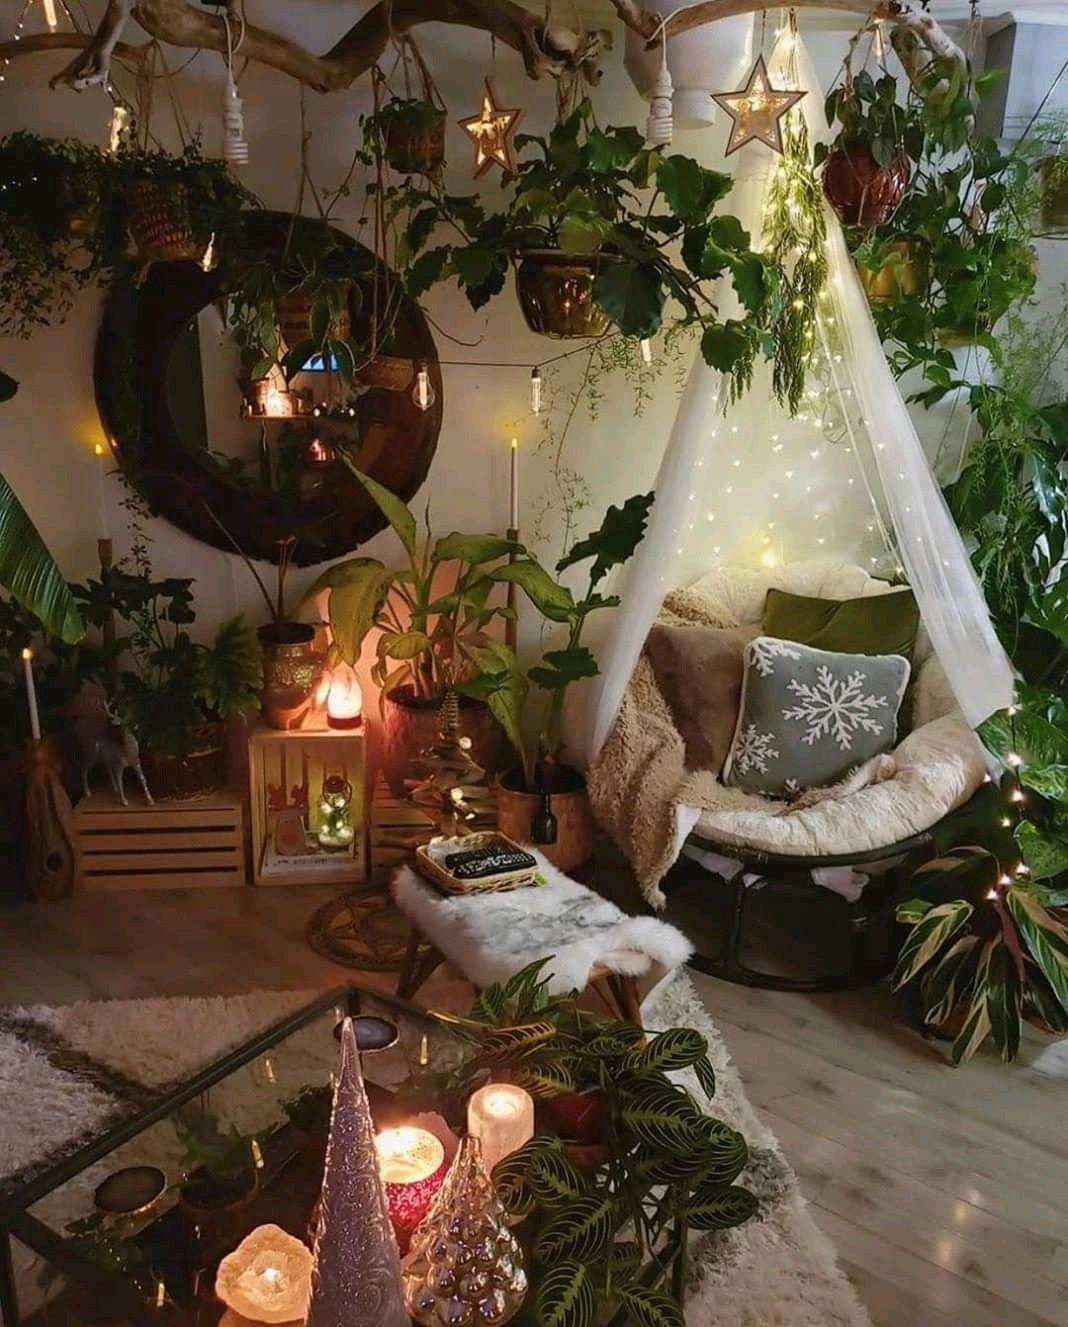 Photo of décoration chambre Bohême, #Bedroom #Bohemian #Decor #HousePlantsdecoration